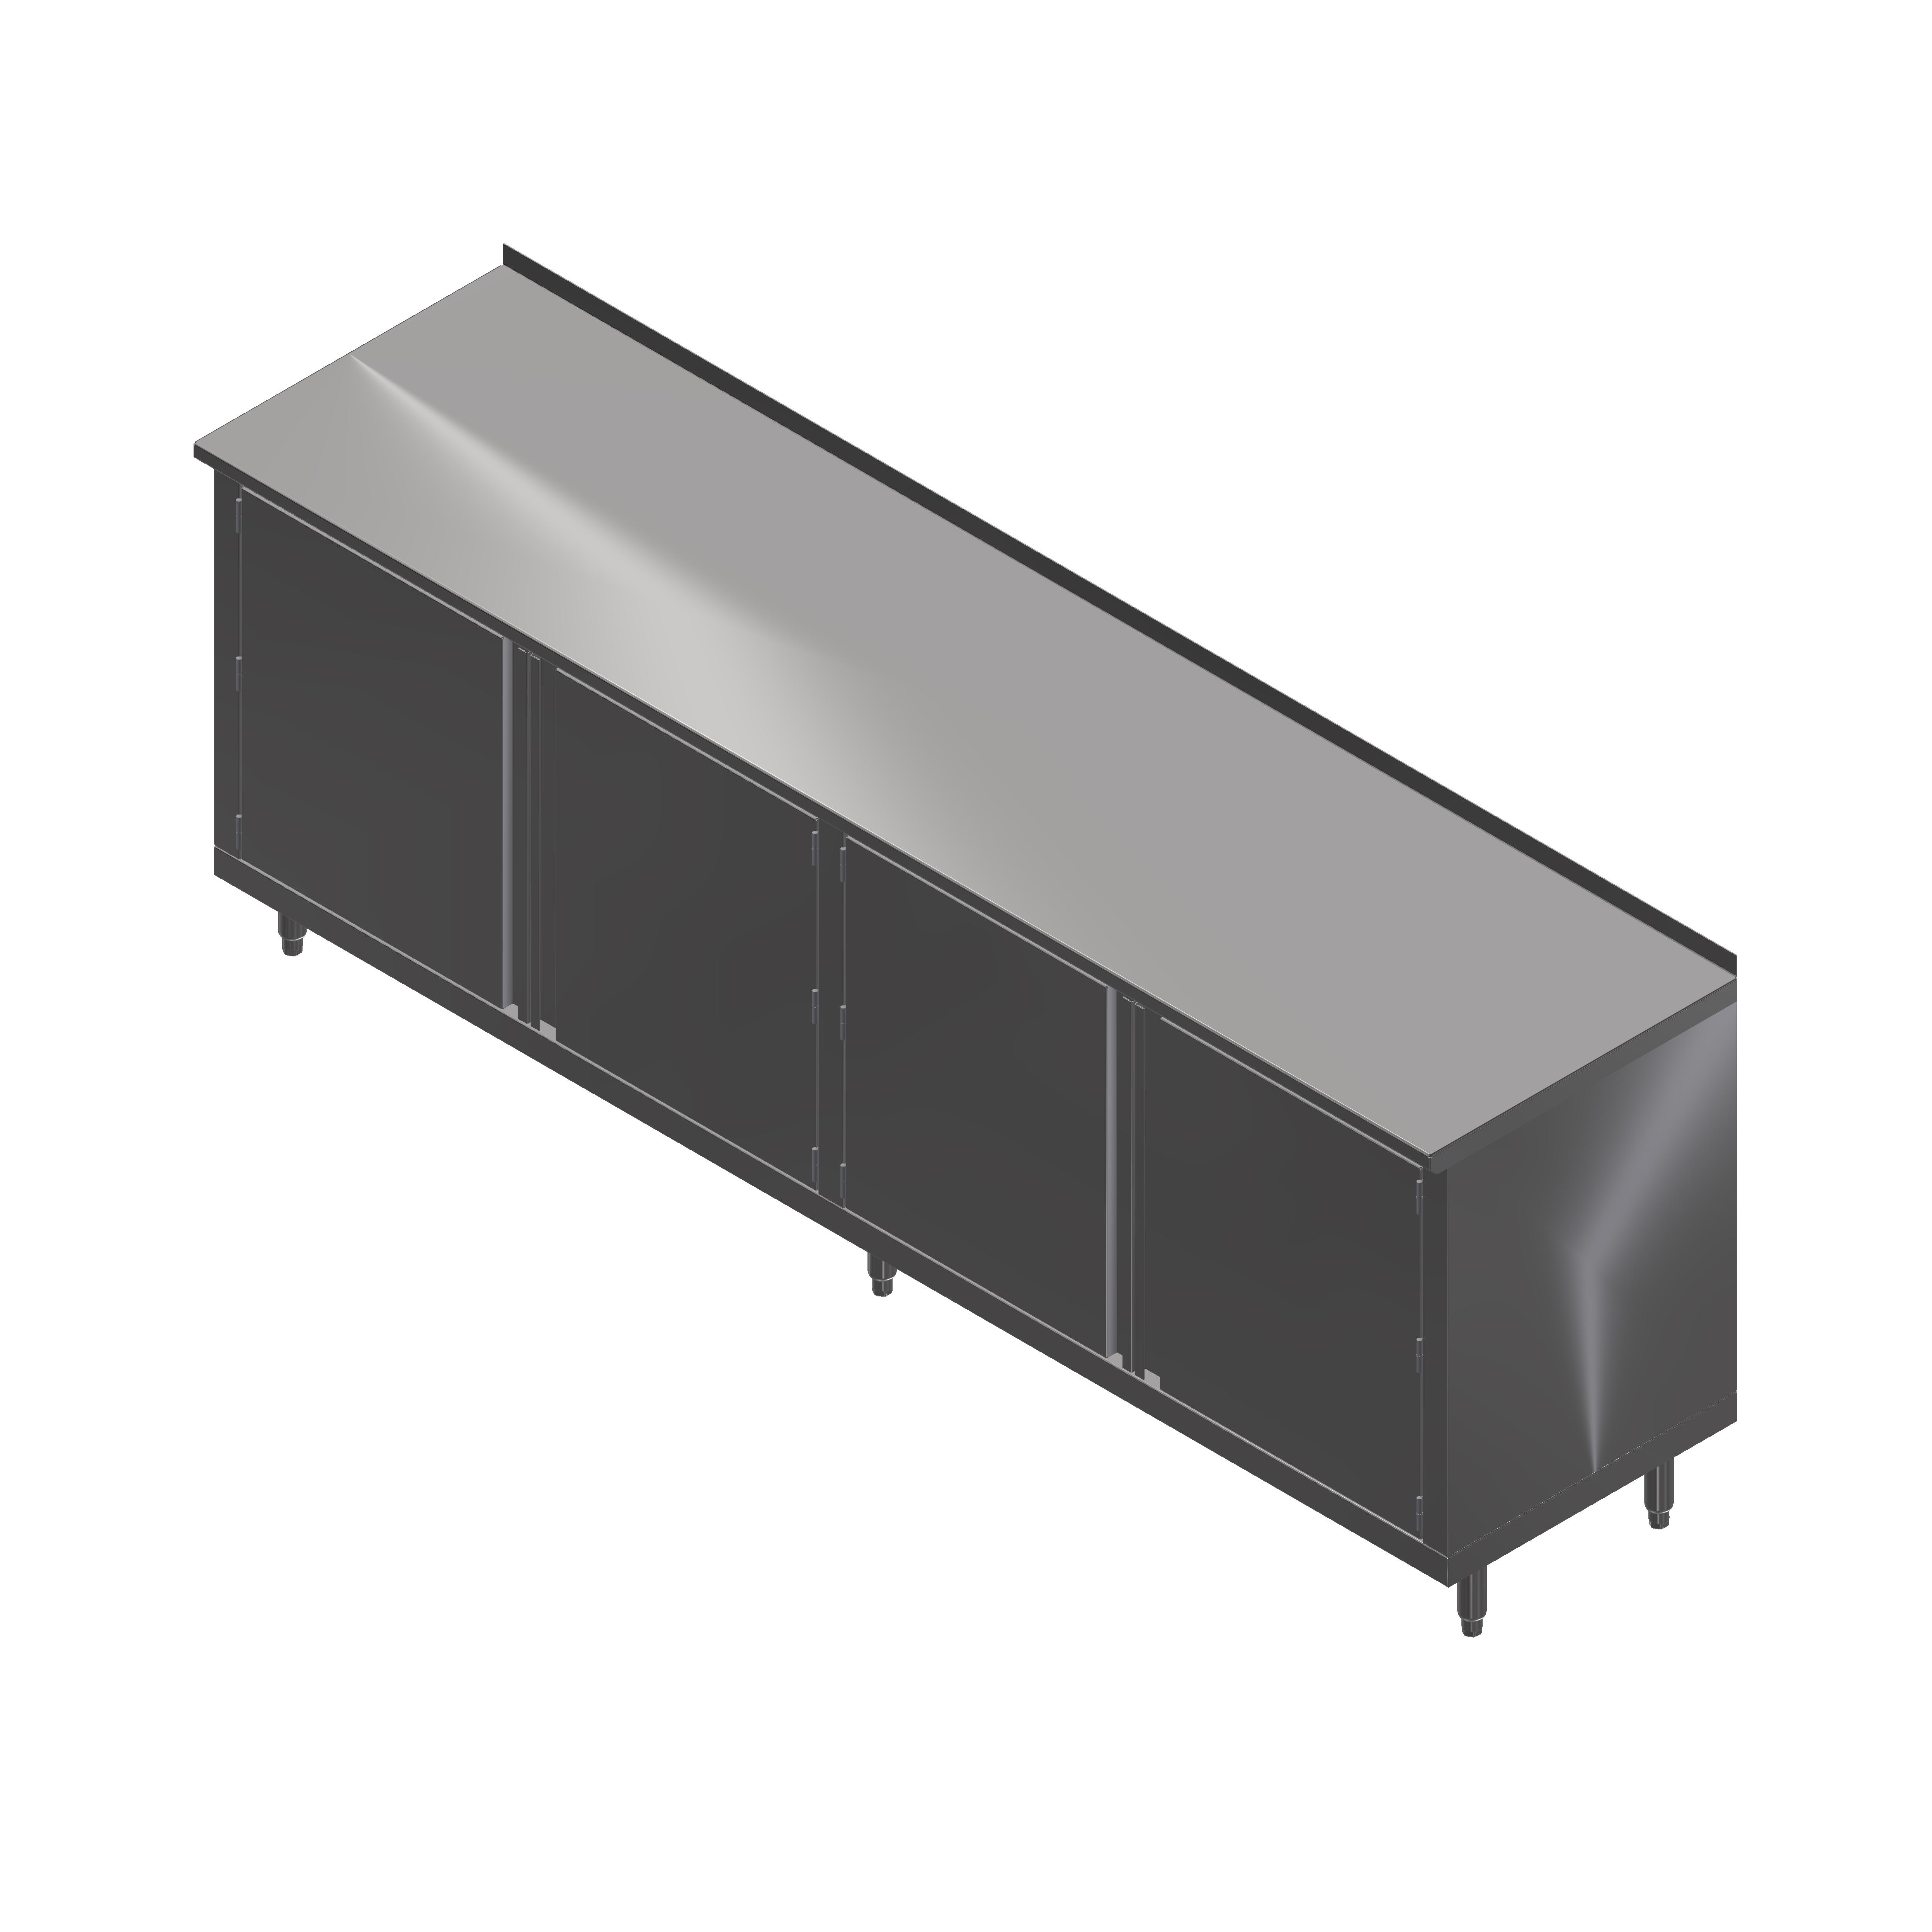 John Boos 4CH4R1.5-3696 work table, cabinet base hinged doors